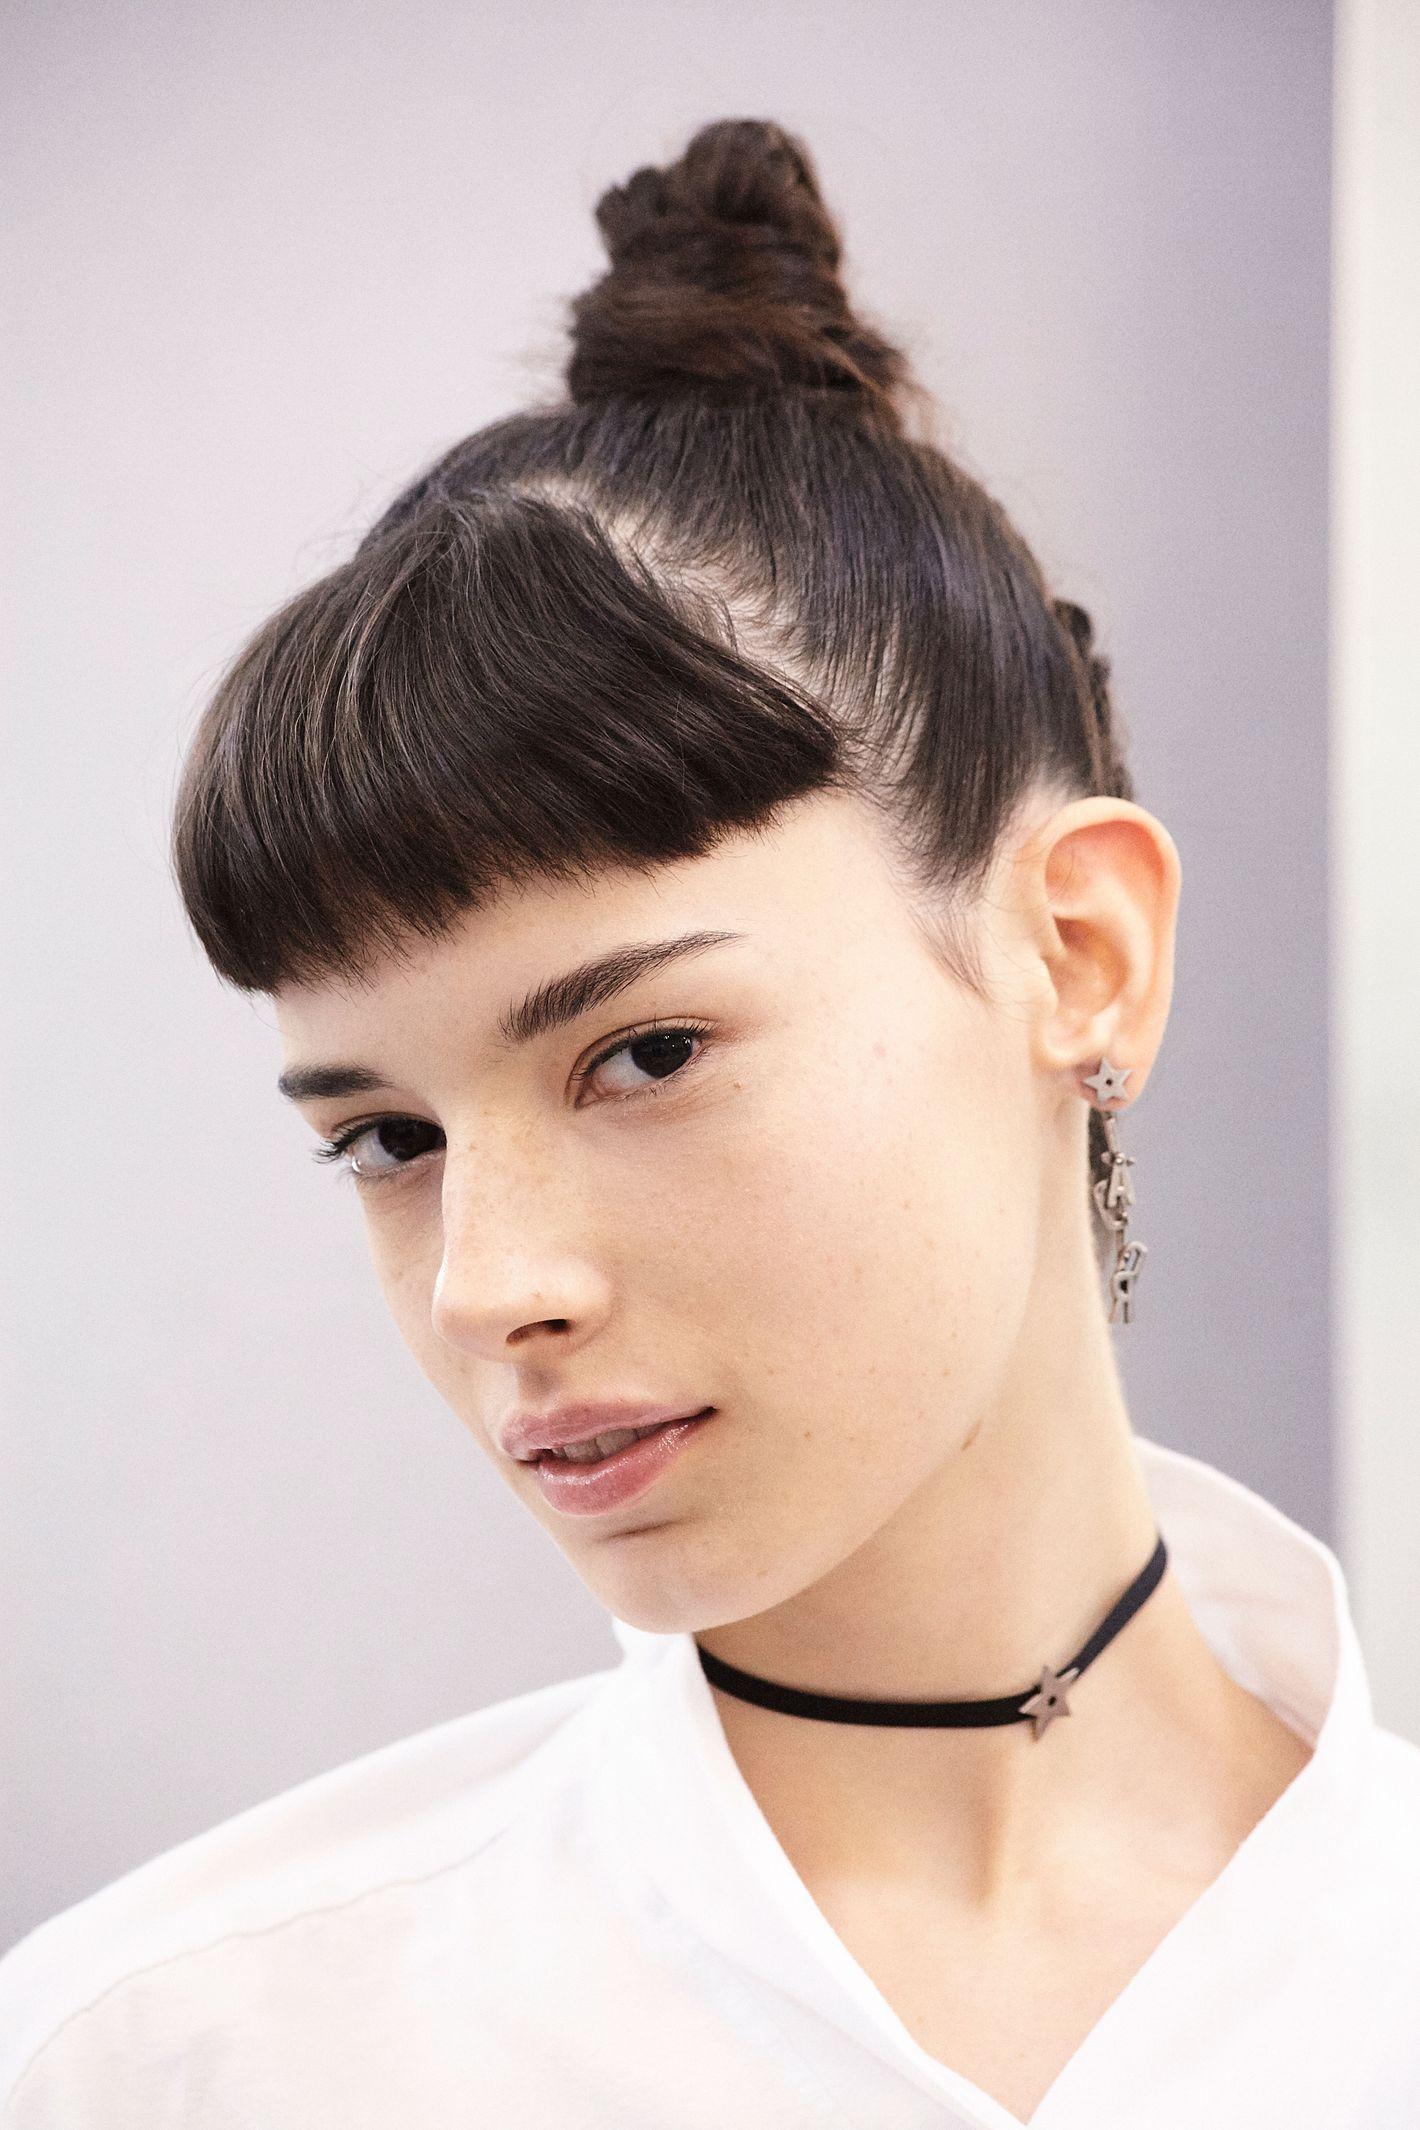 dior's spring 2017 show had girl-power makeup, topknots